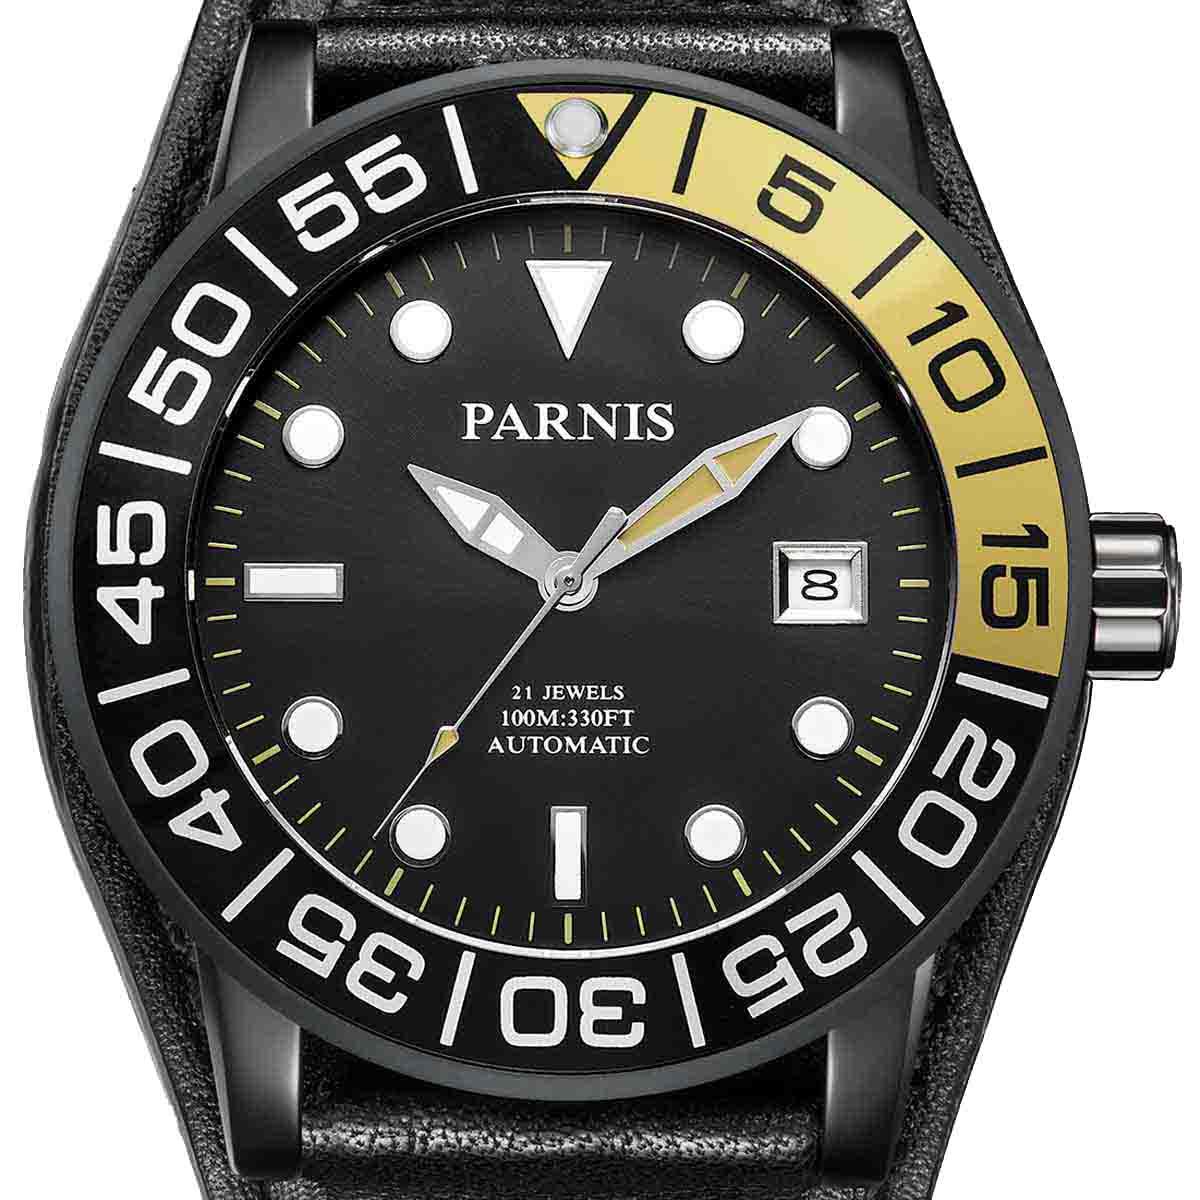 【NEW】PARNIS パーニス 自動巻き 腕時計 [PA6056-S3AL-BKylBK] 並行輸入品 純正ケース メーカー保証12ヶ月